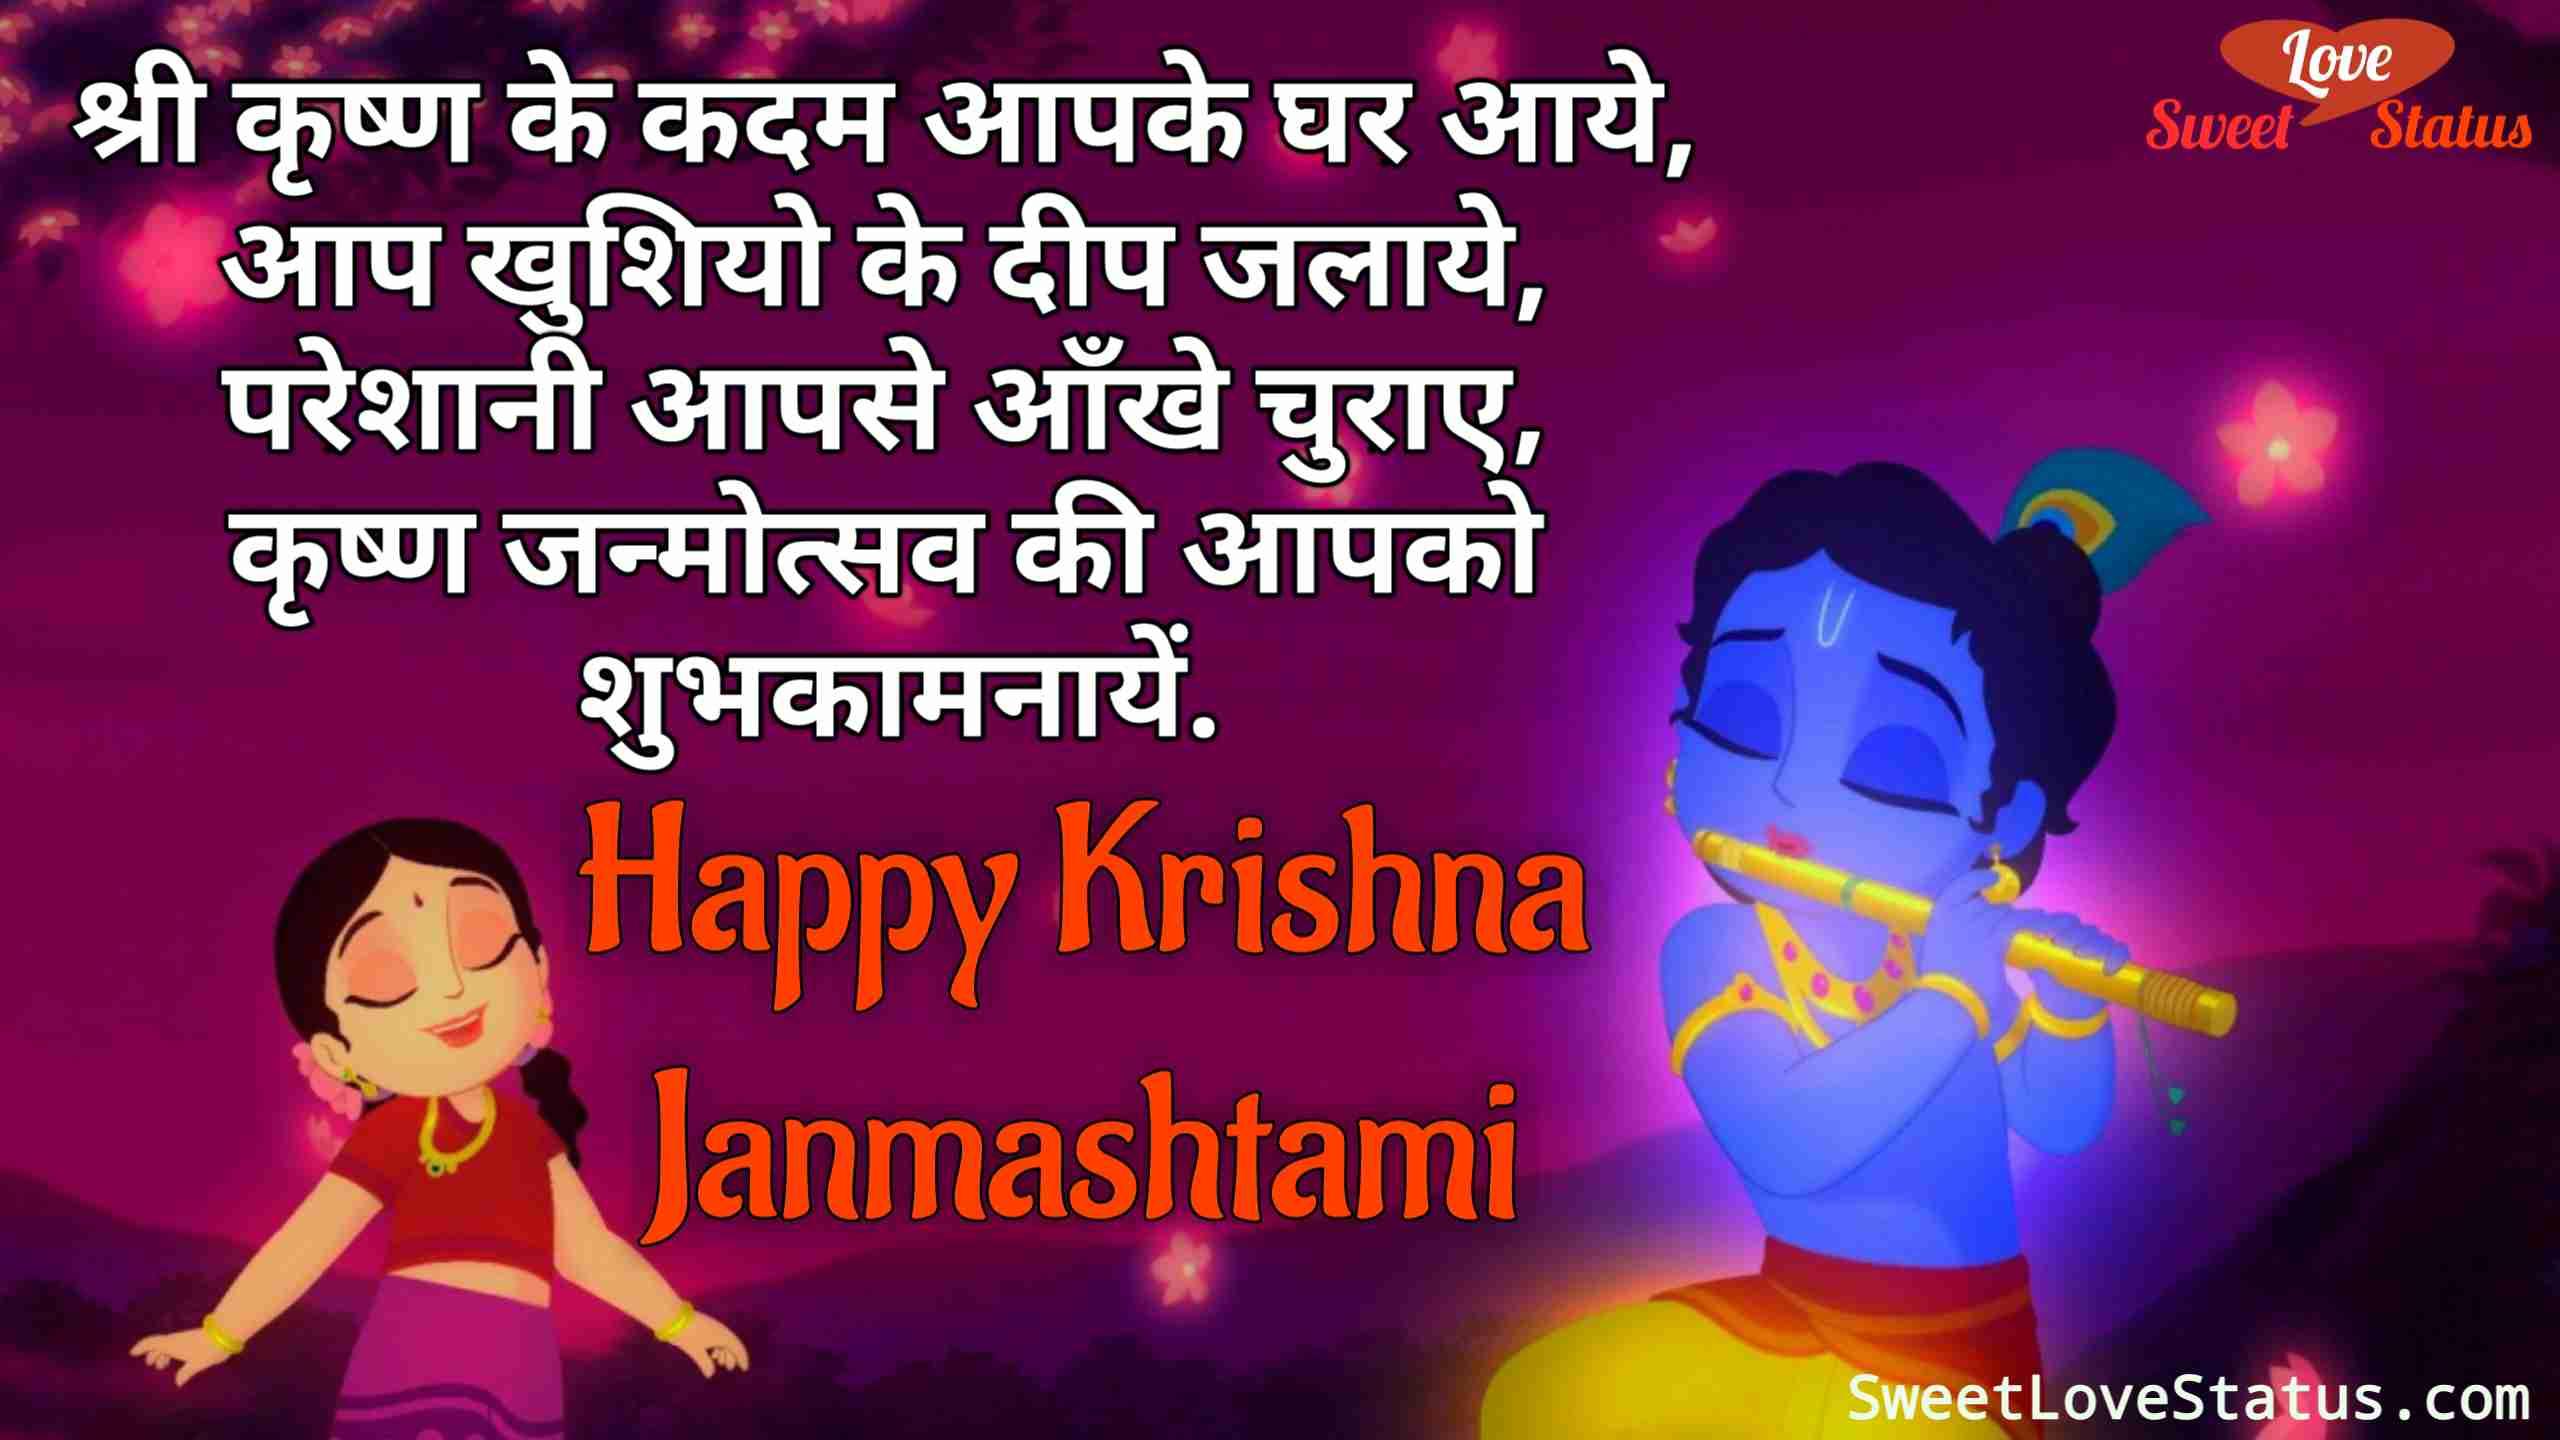 happy janmashtami images, Happy krishna janmashtami images, Happy janmashtami wallpapers, Krishna janmashtami pictures,